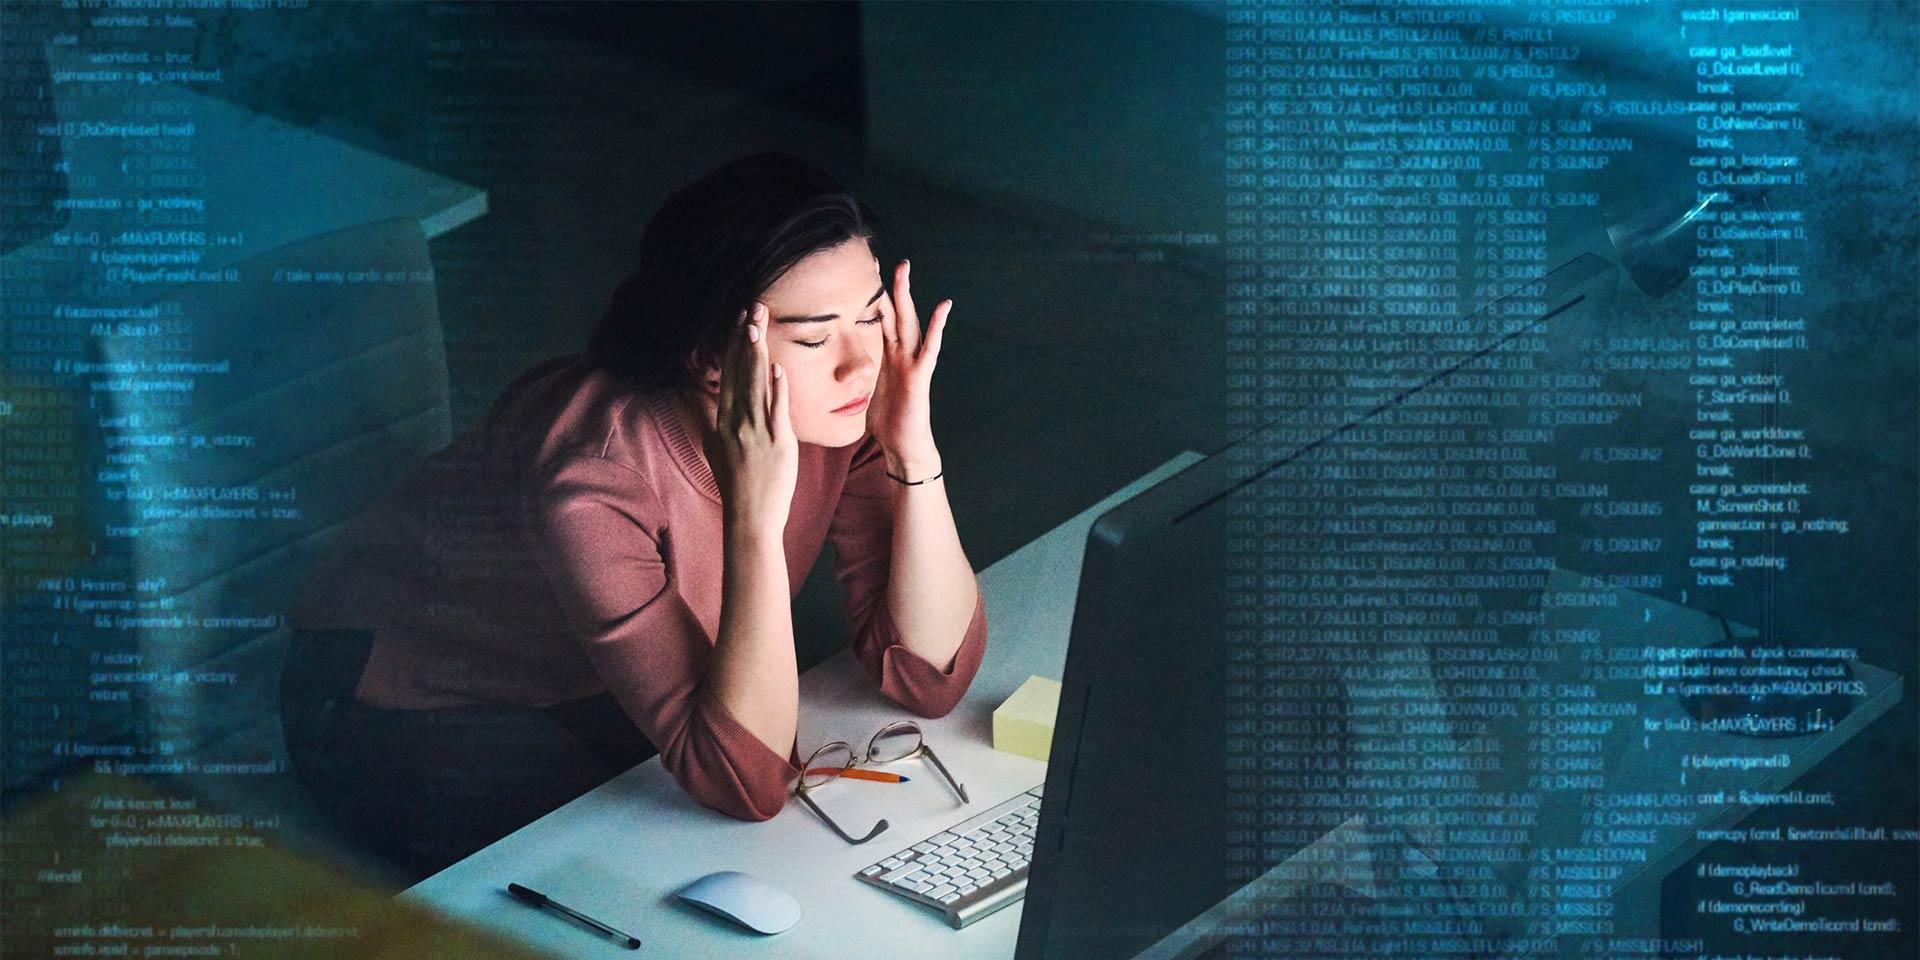 Frau arbeitet frustriert am Computer